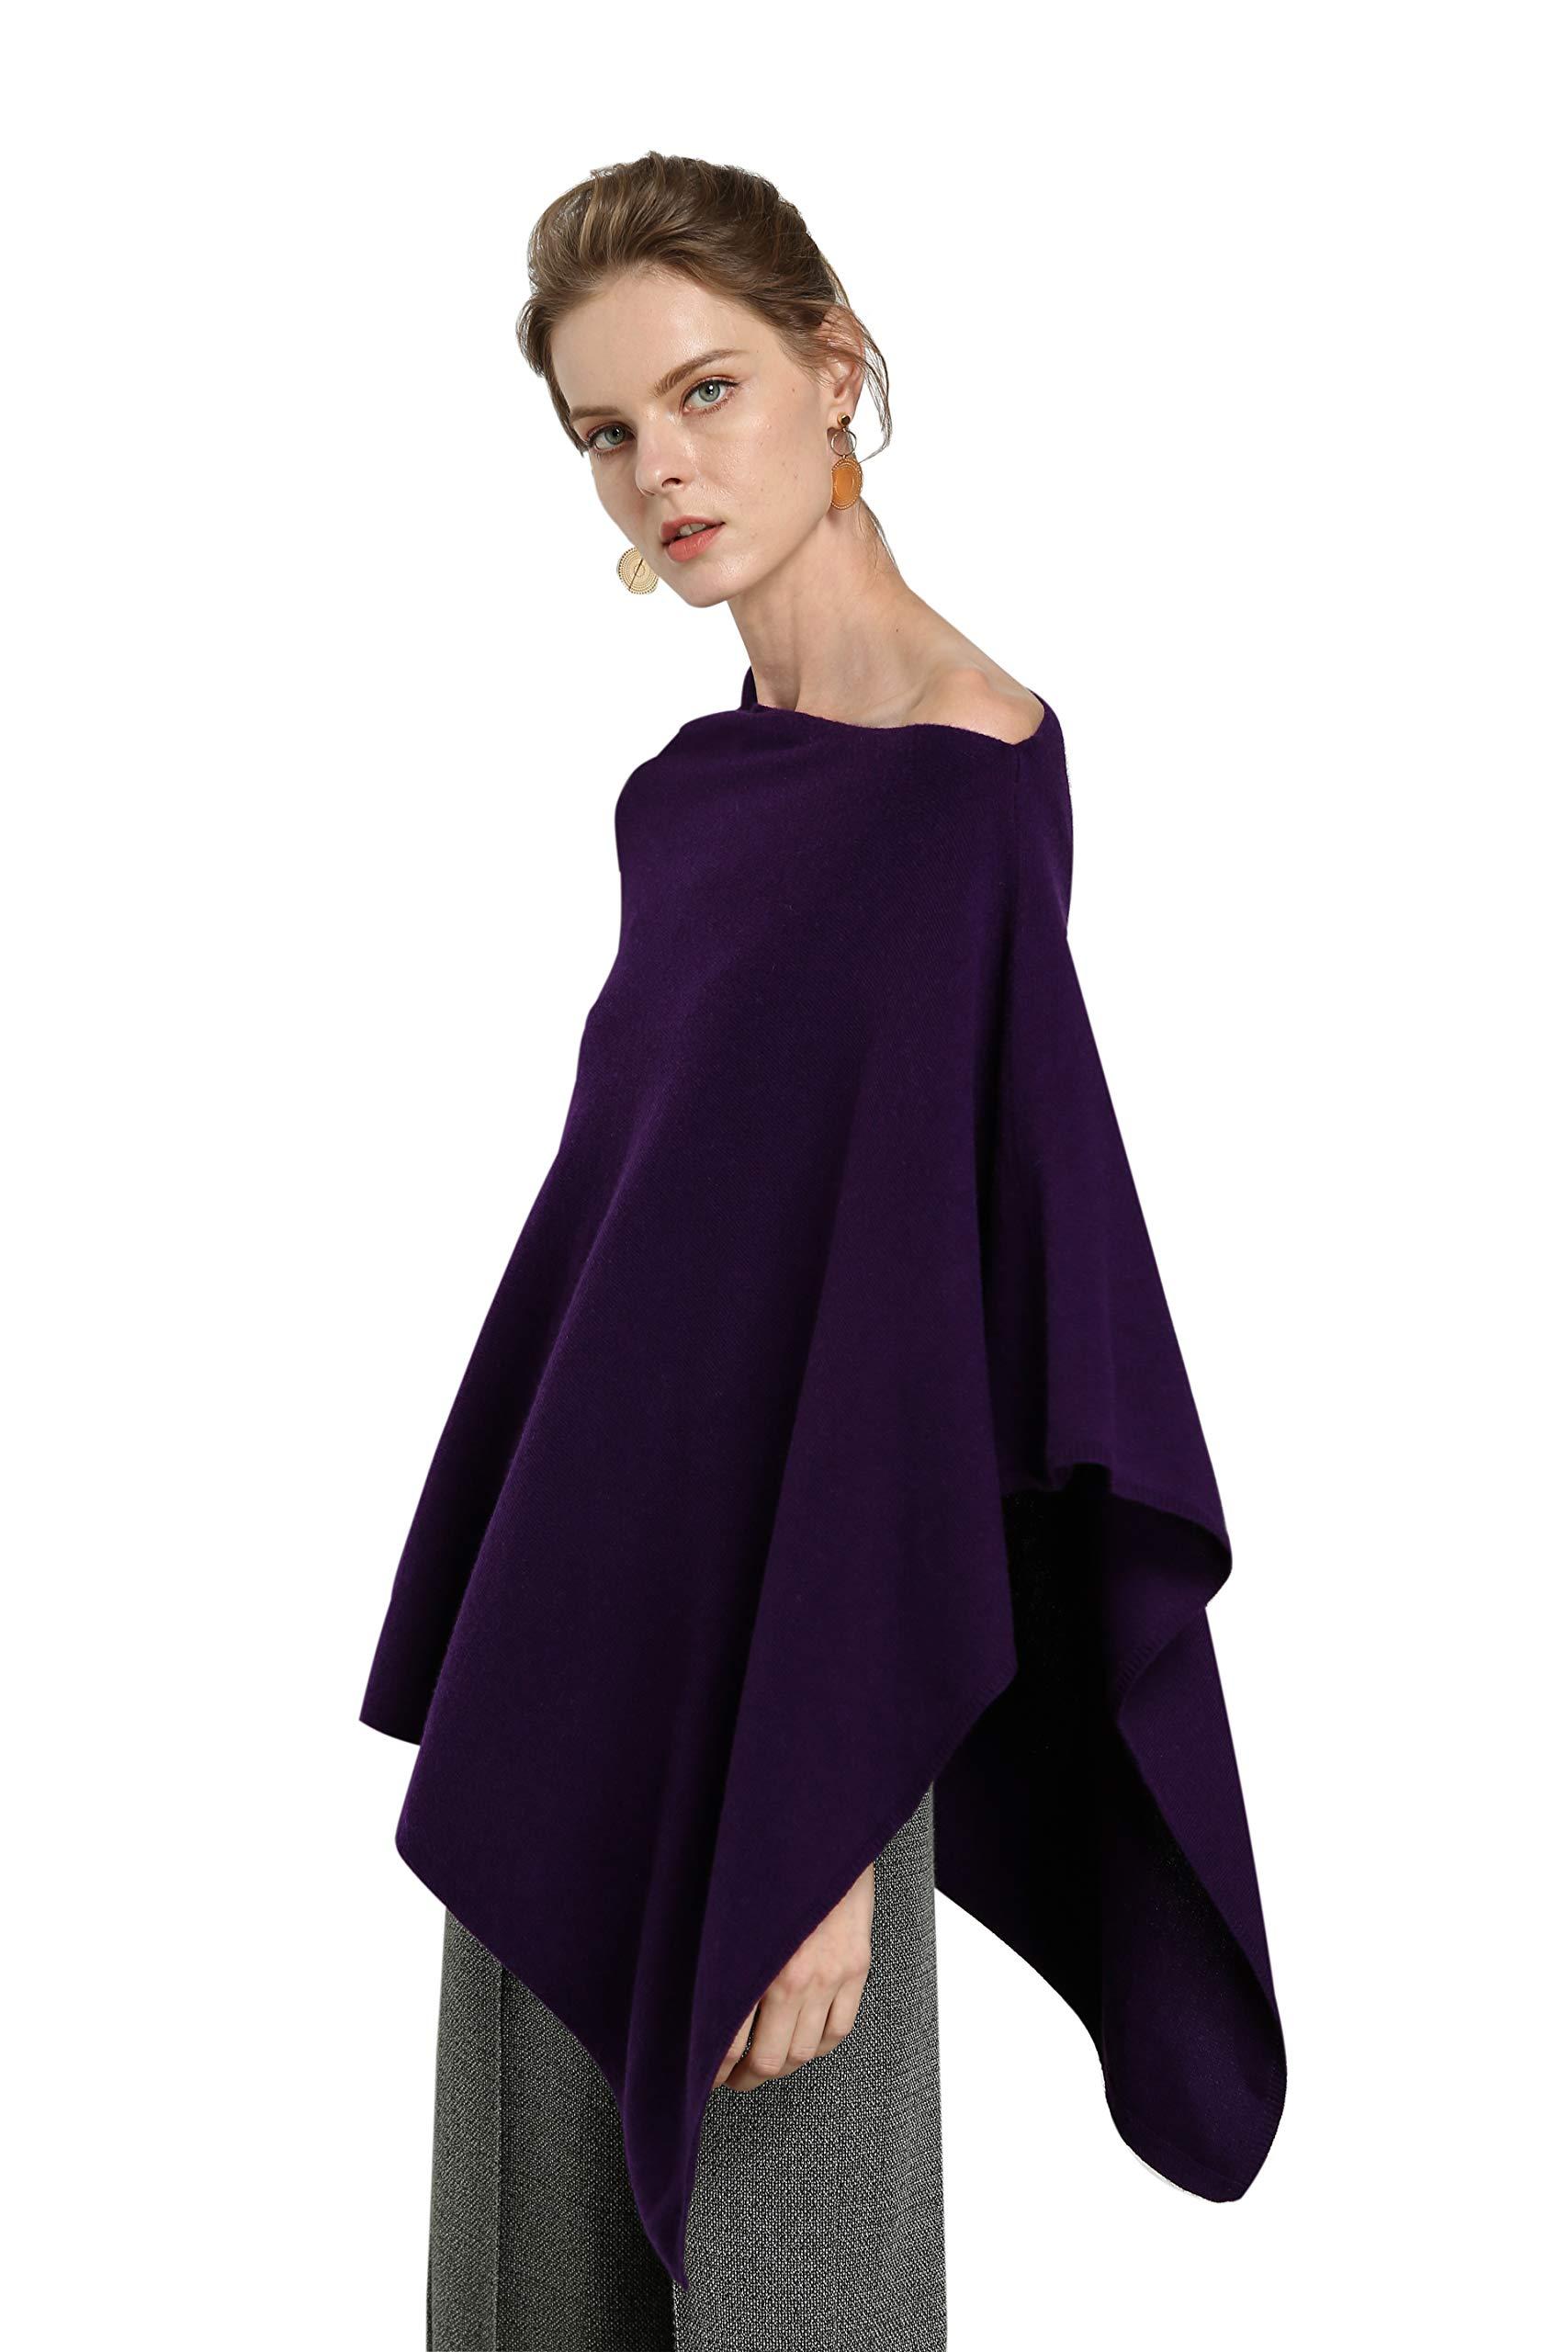 Women's Pure Cashmere Scarf Pashmina Asymmetrical 100% Cashmere Luxury Oversized Ponchos (One Size, 9018 Purple)